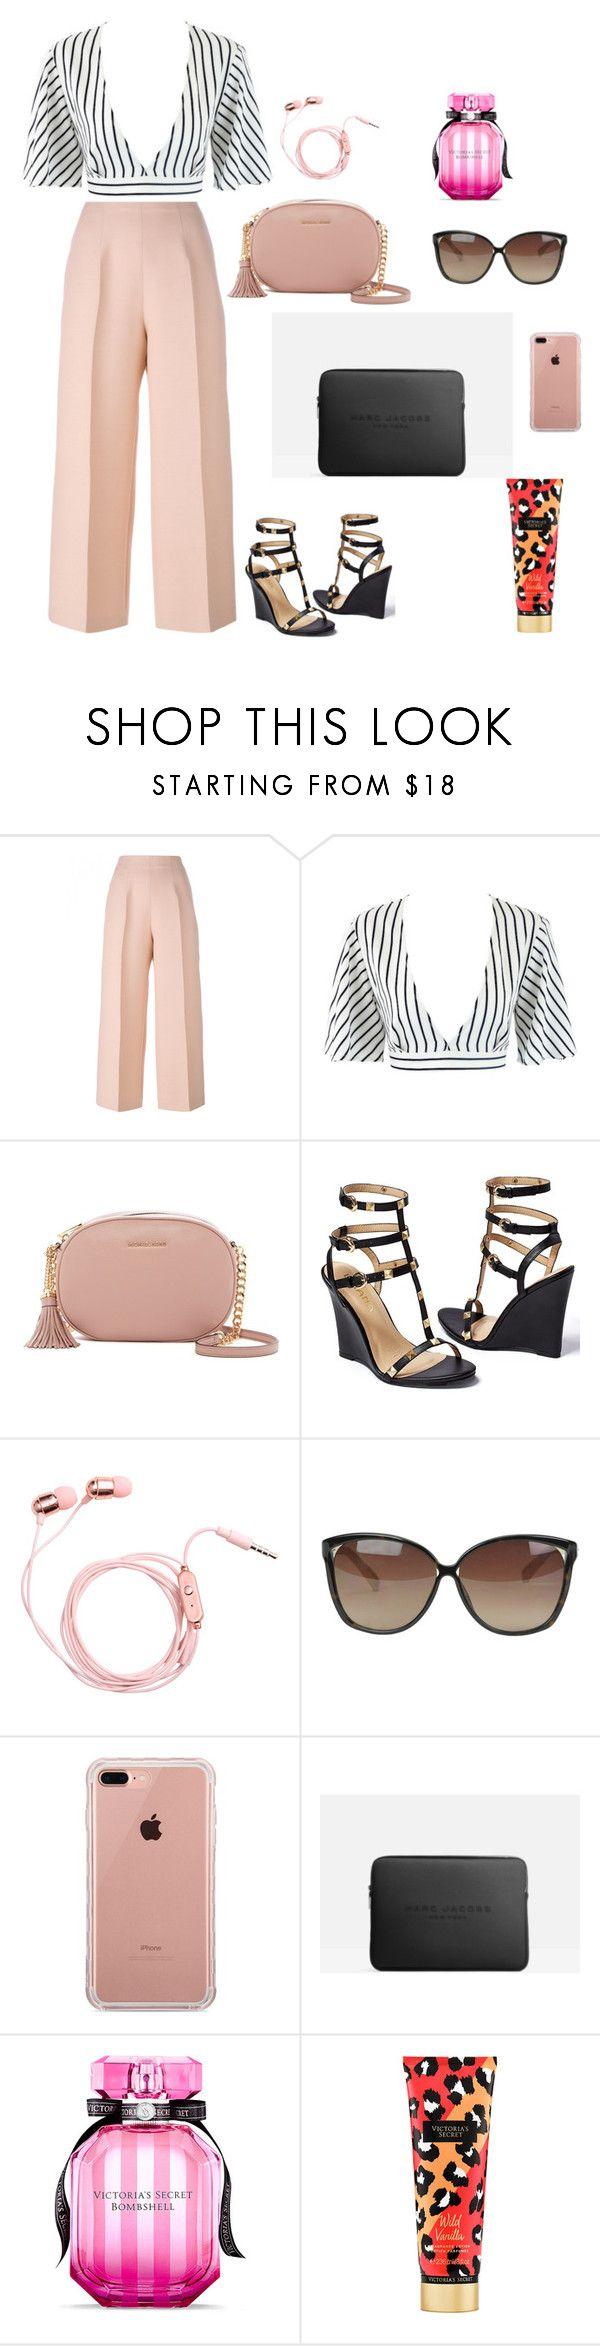 """work with fashion"" by shivani-arvind on Polyvore featuring Fendi, MICHAEL Michael Kors, Venus, Linda Farrow, Belkin, Marc Jacobs and Victoria's Secret"